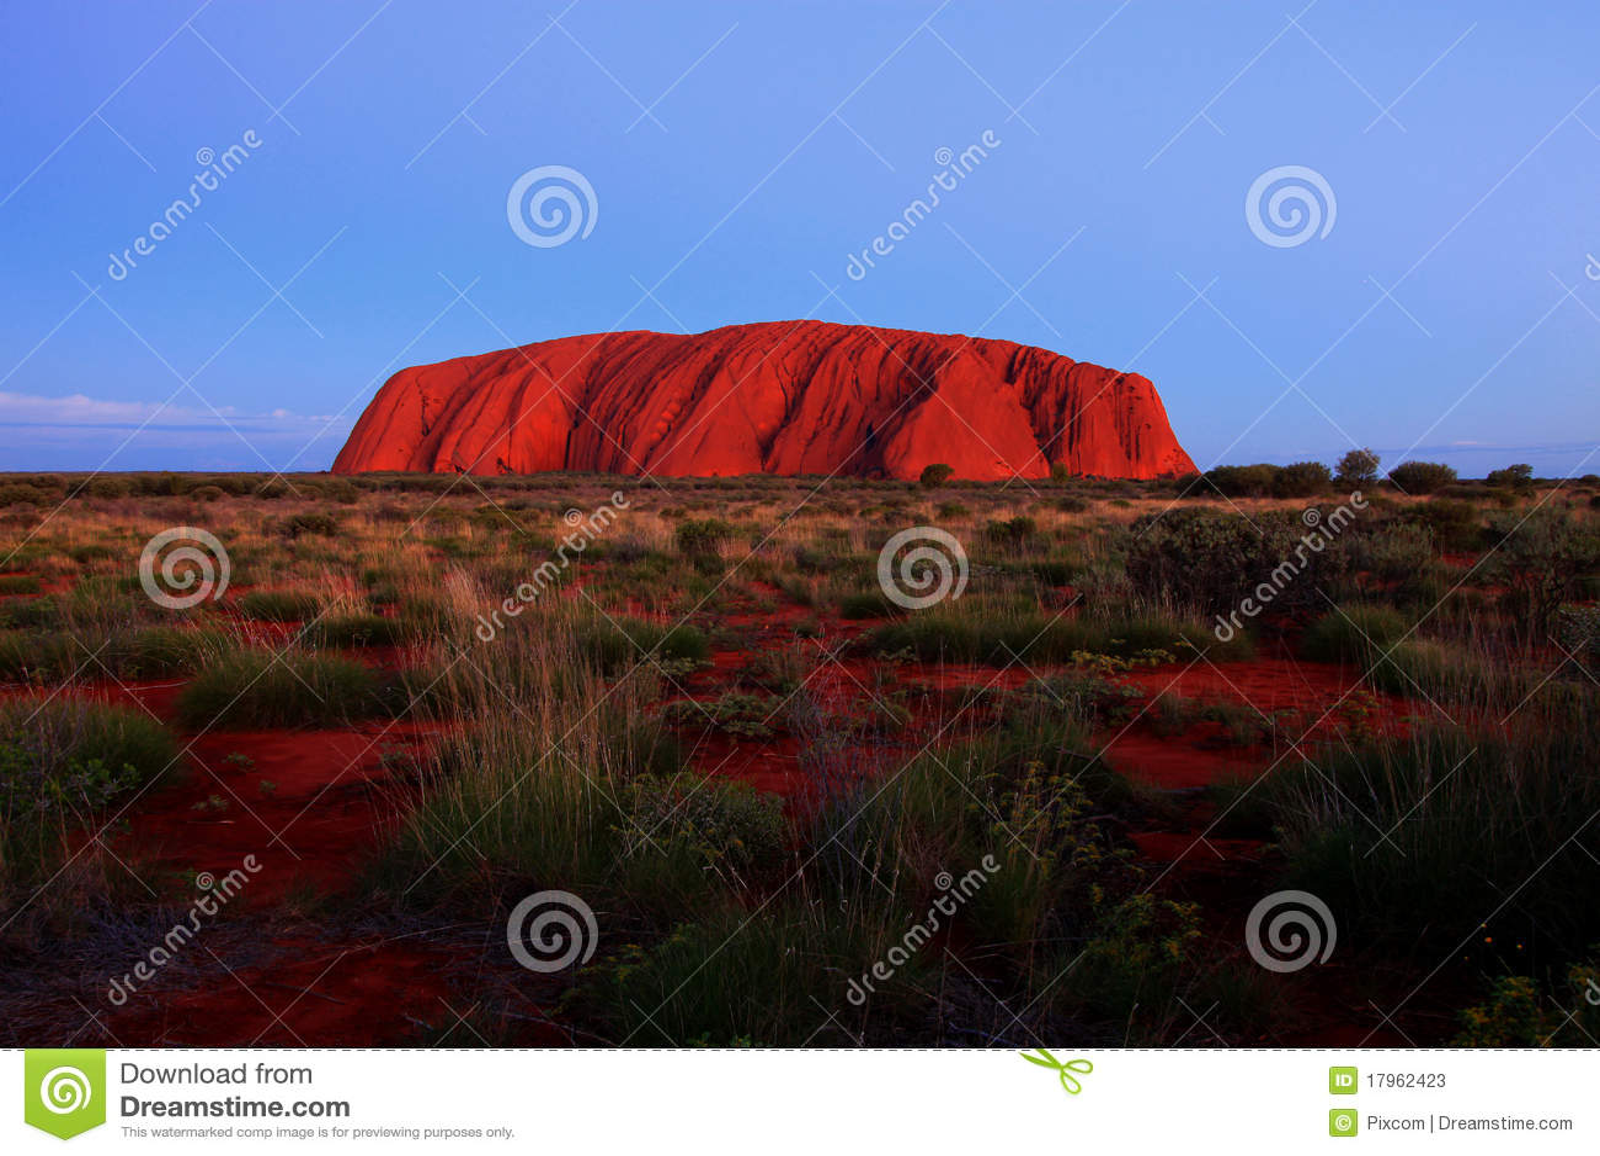 Roca de Ayers - Uluru